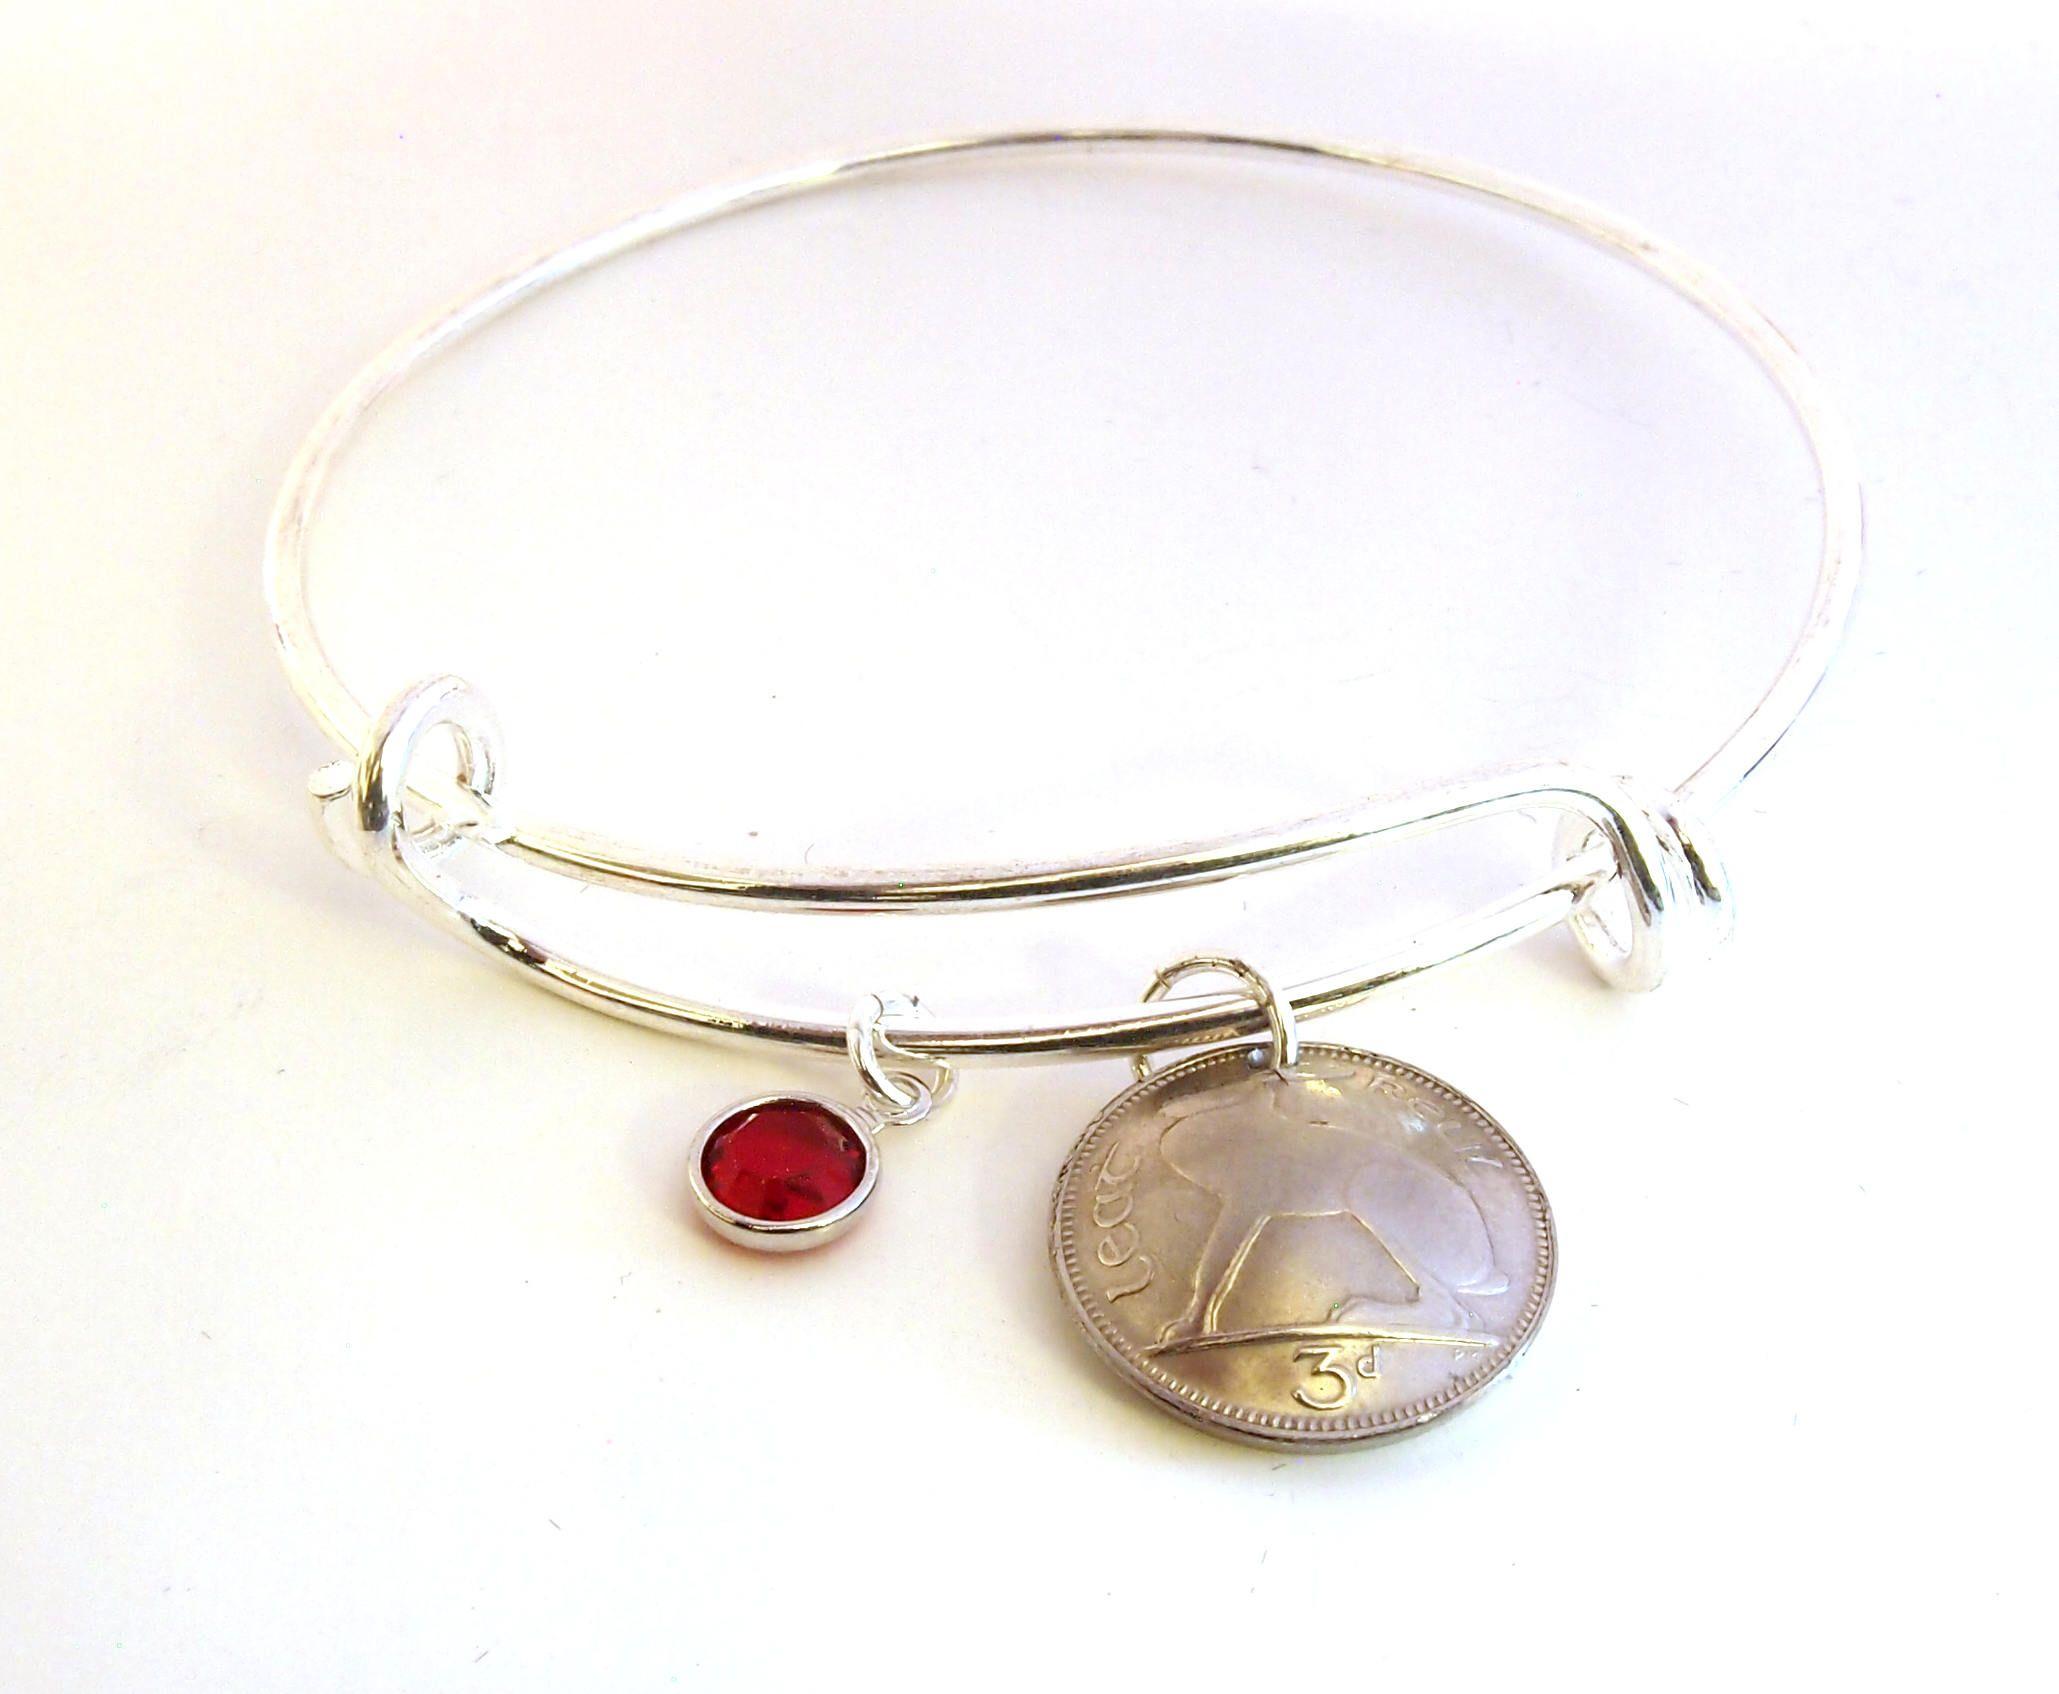 1968 Birthday Gift, Irish Charm Bracelet, 1968 Jewelry